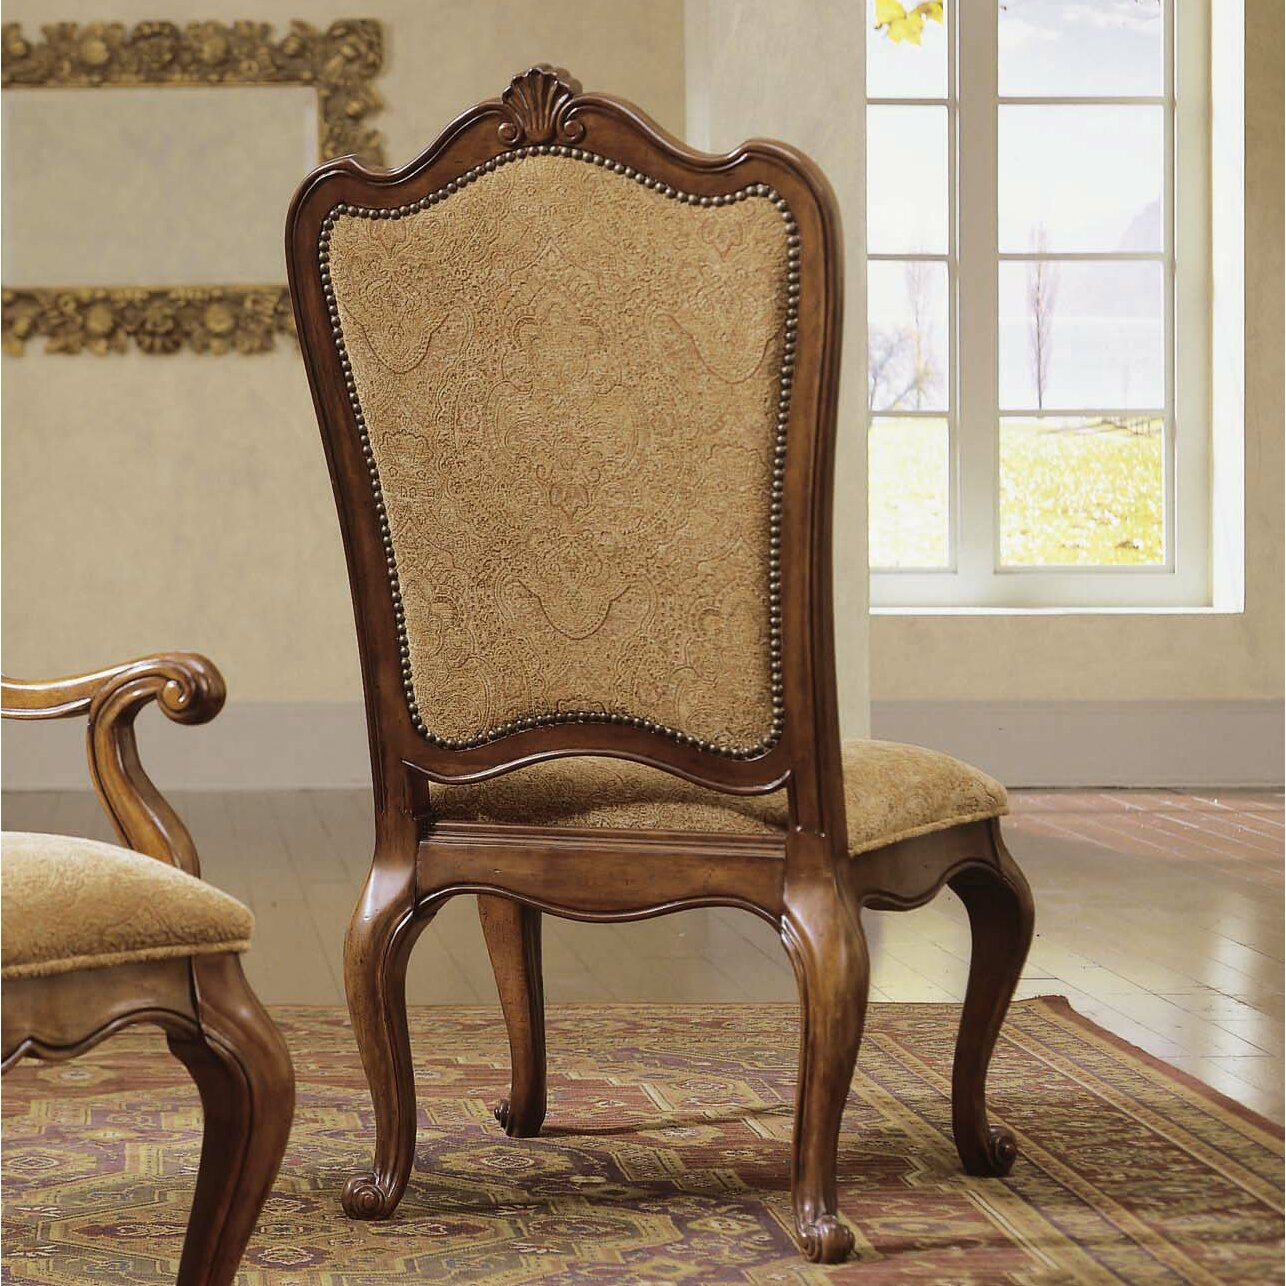 Model 16 Universal Furniture Villa Cortina Wallpaper Cool Hd